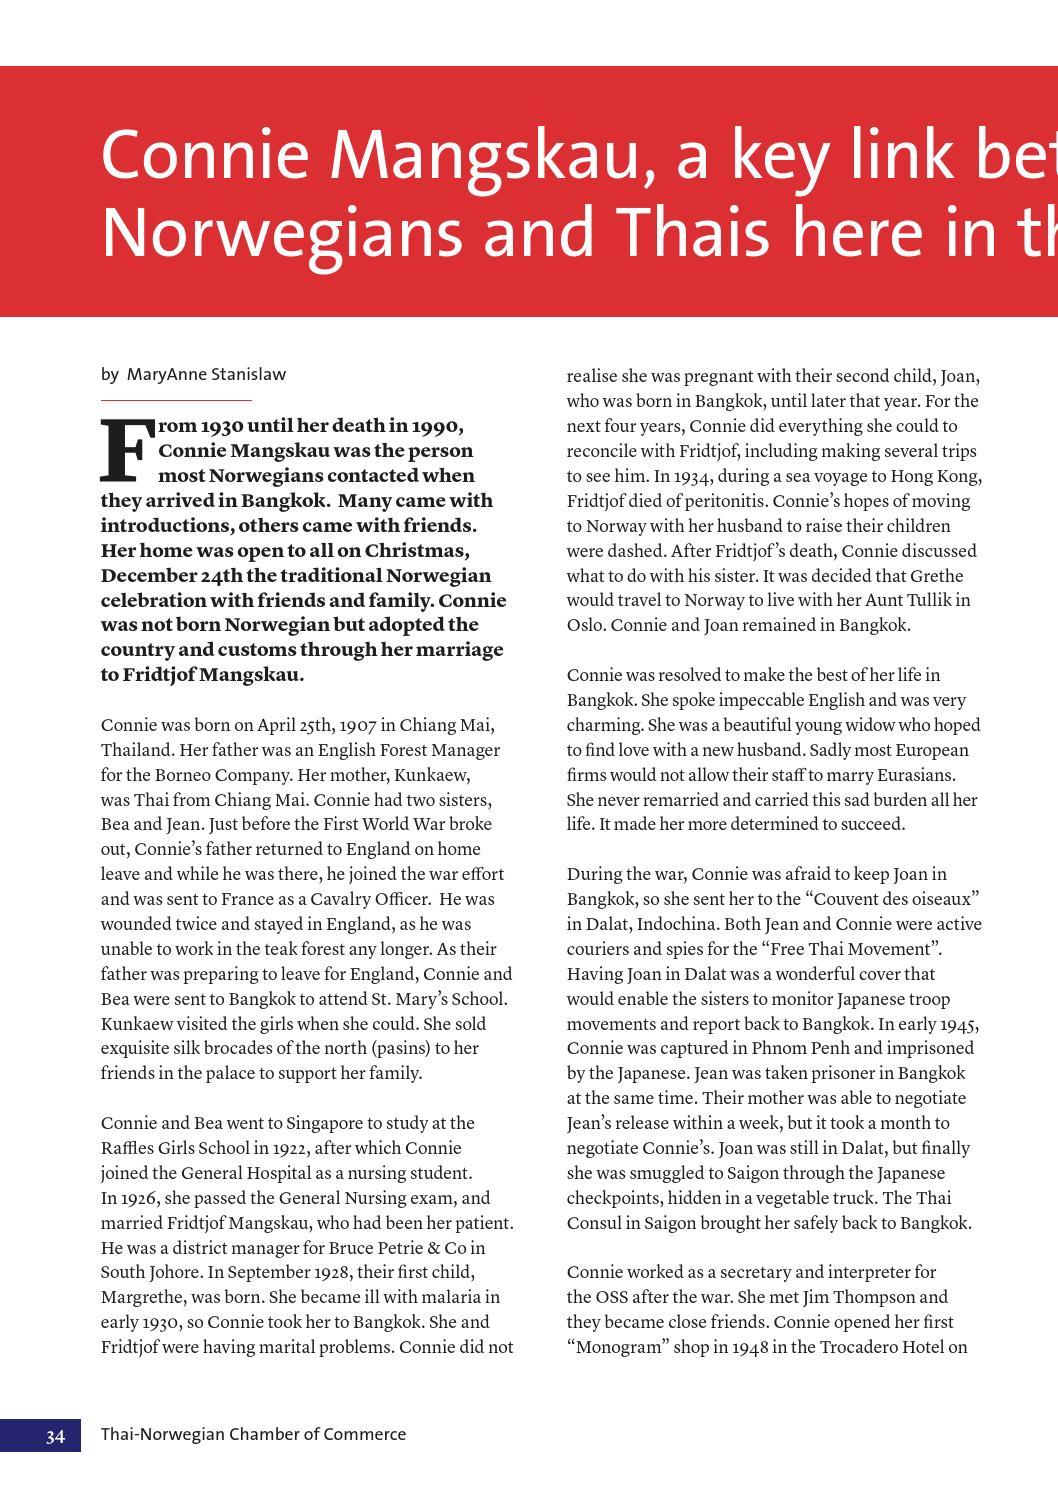 Thai-Norwegian Business Review 2-2013 by Thai-Norwegian